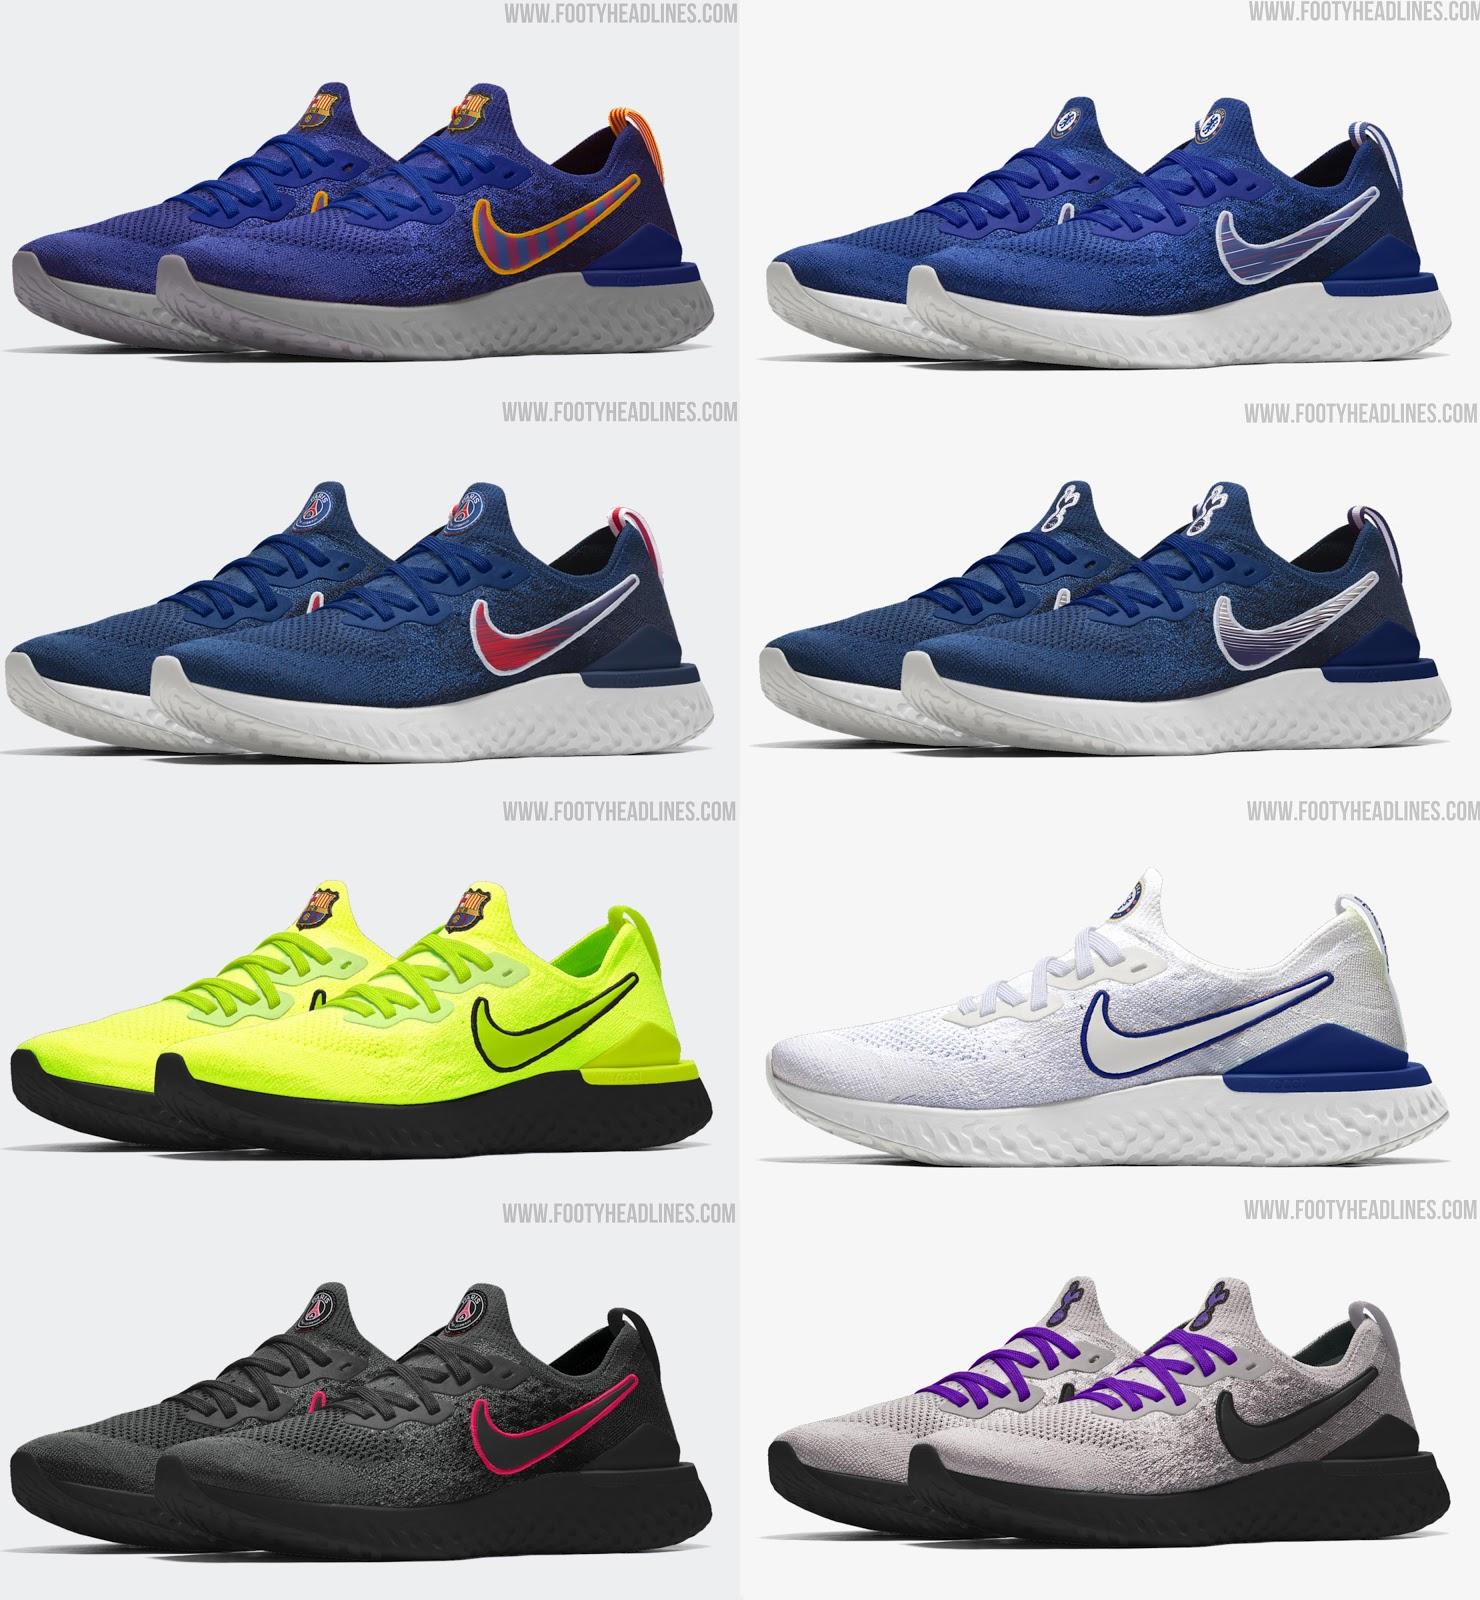 ce3f07c70eacb Nike FC Barcelona